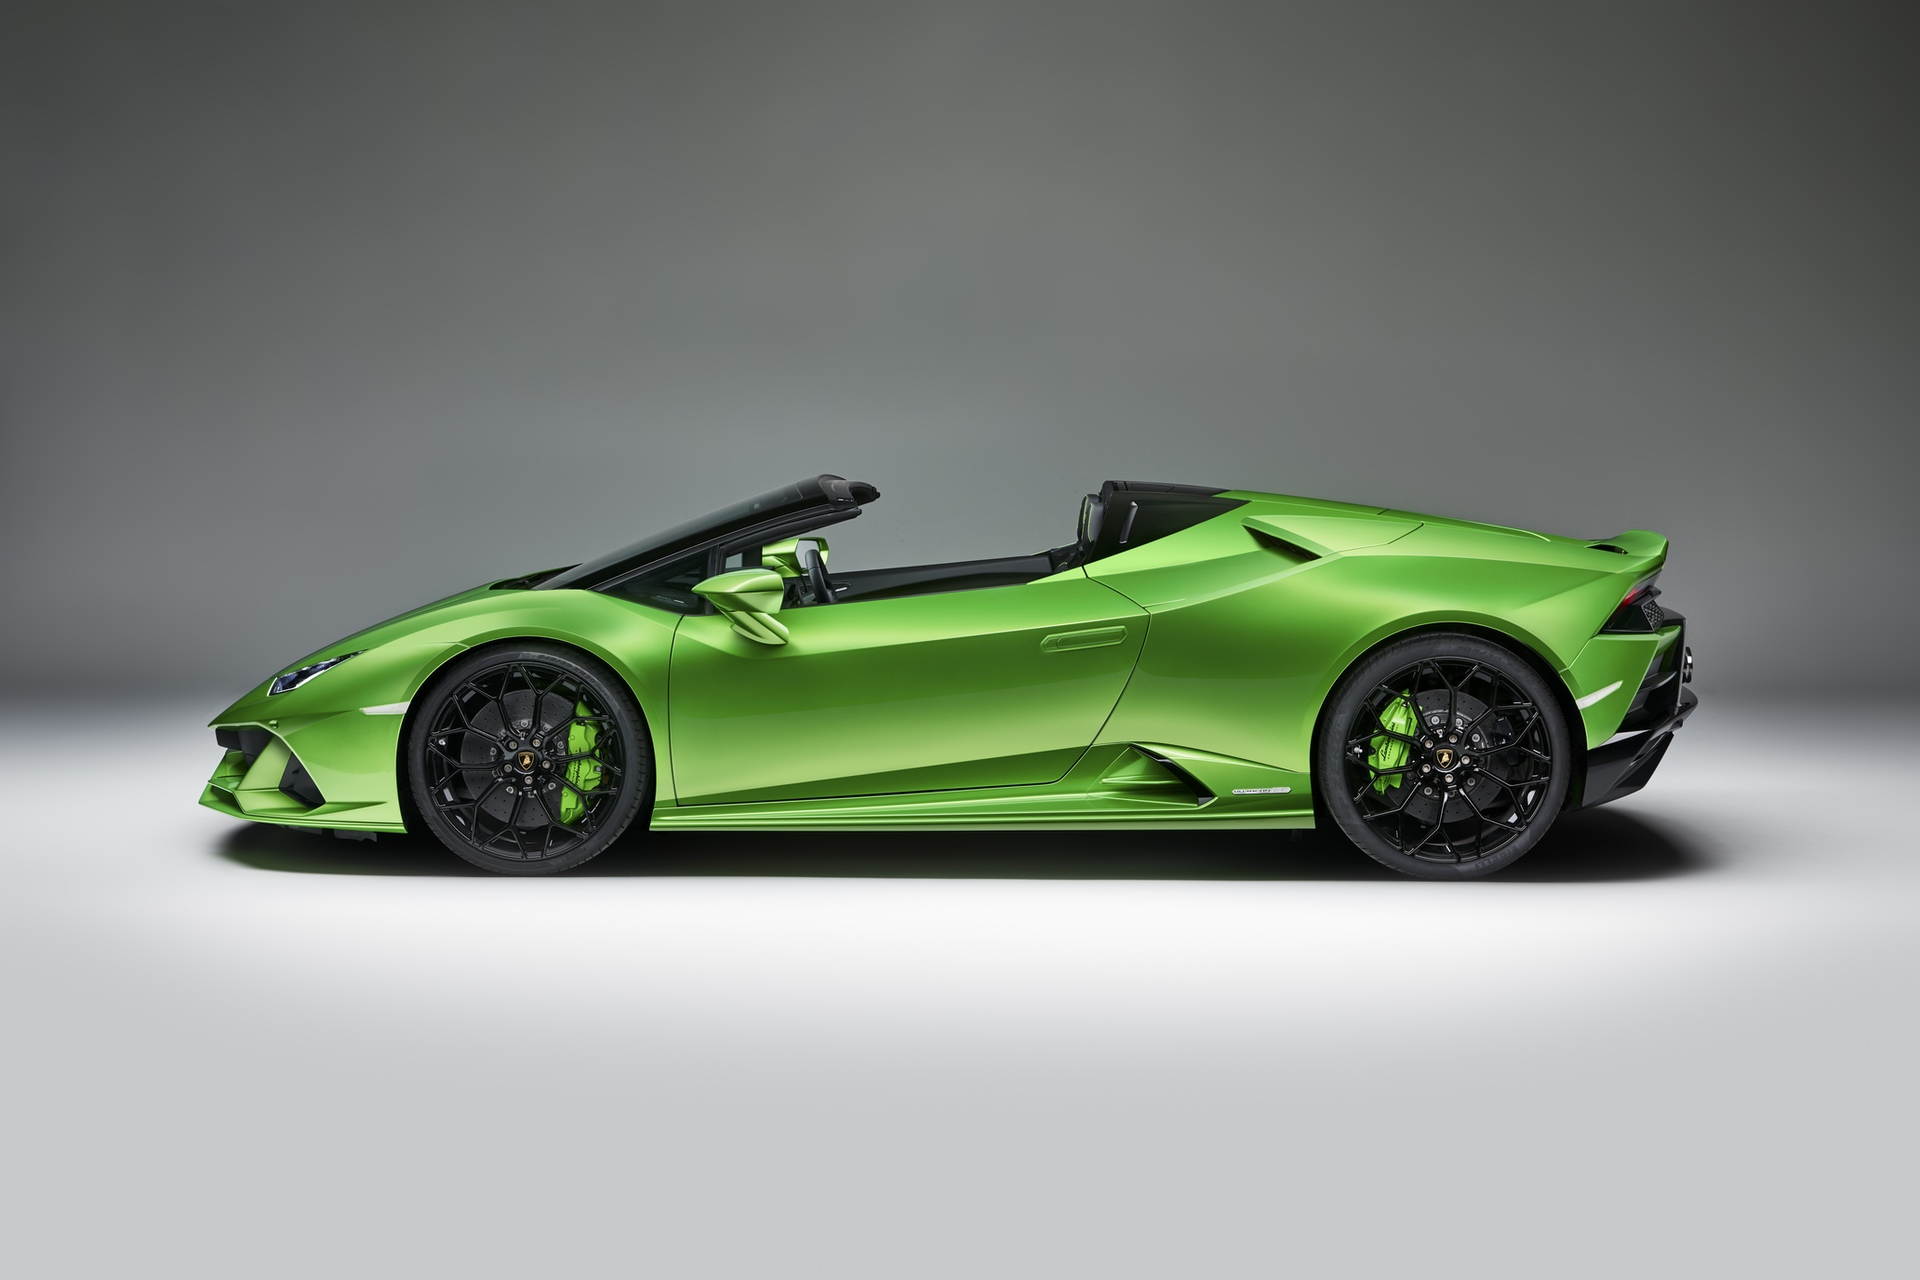 Lamborghini_Huracan_Evo_Spyder_0021